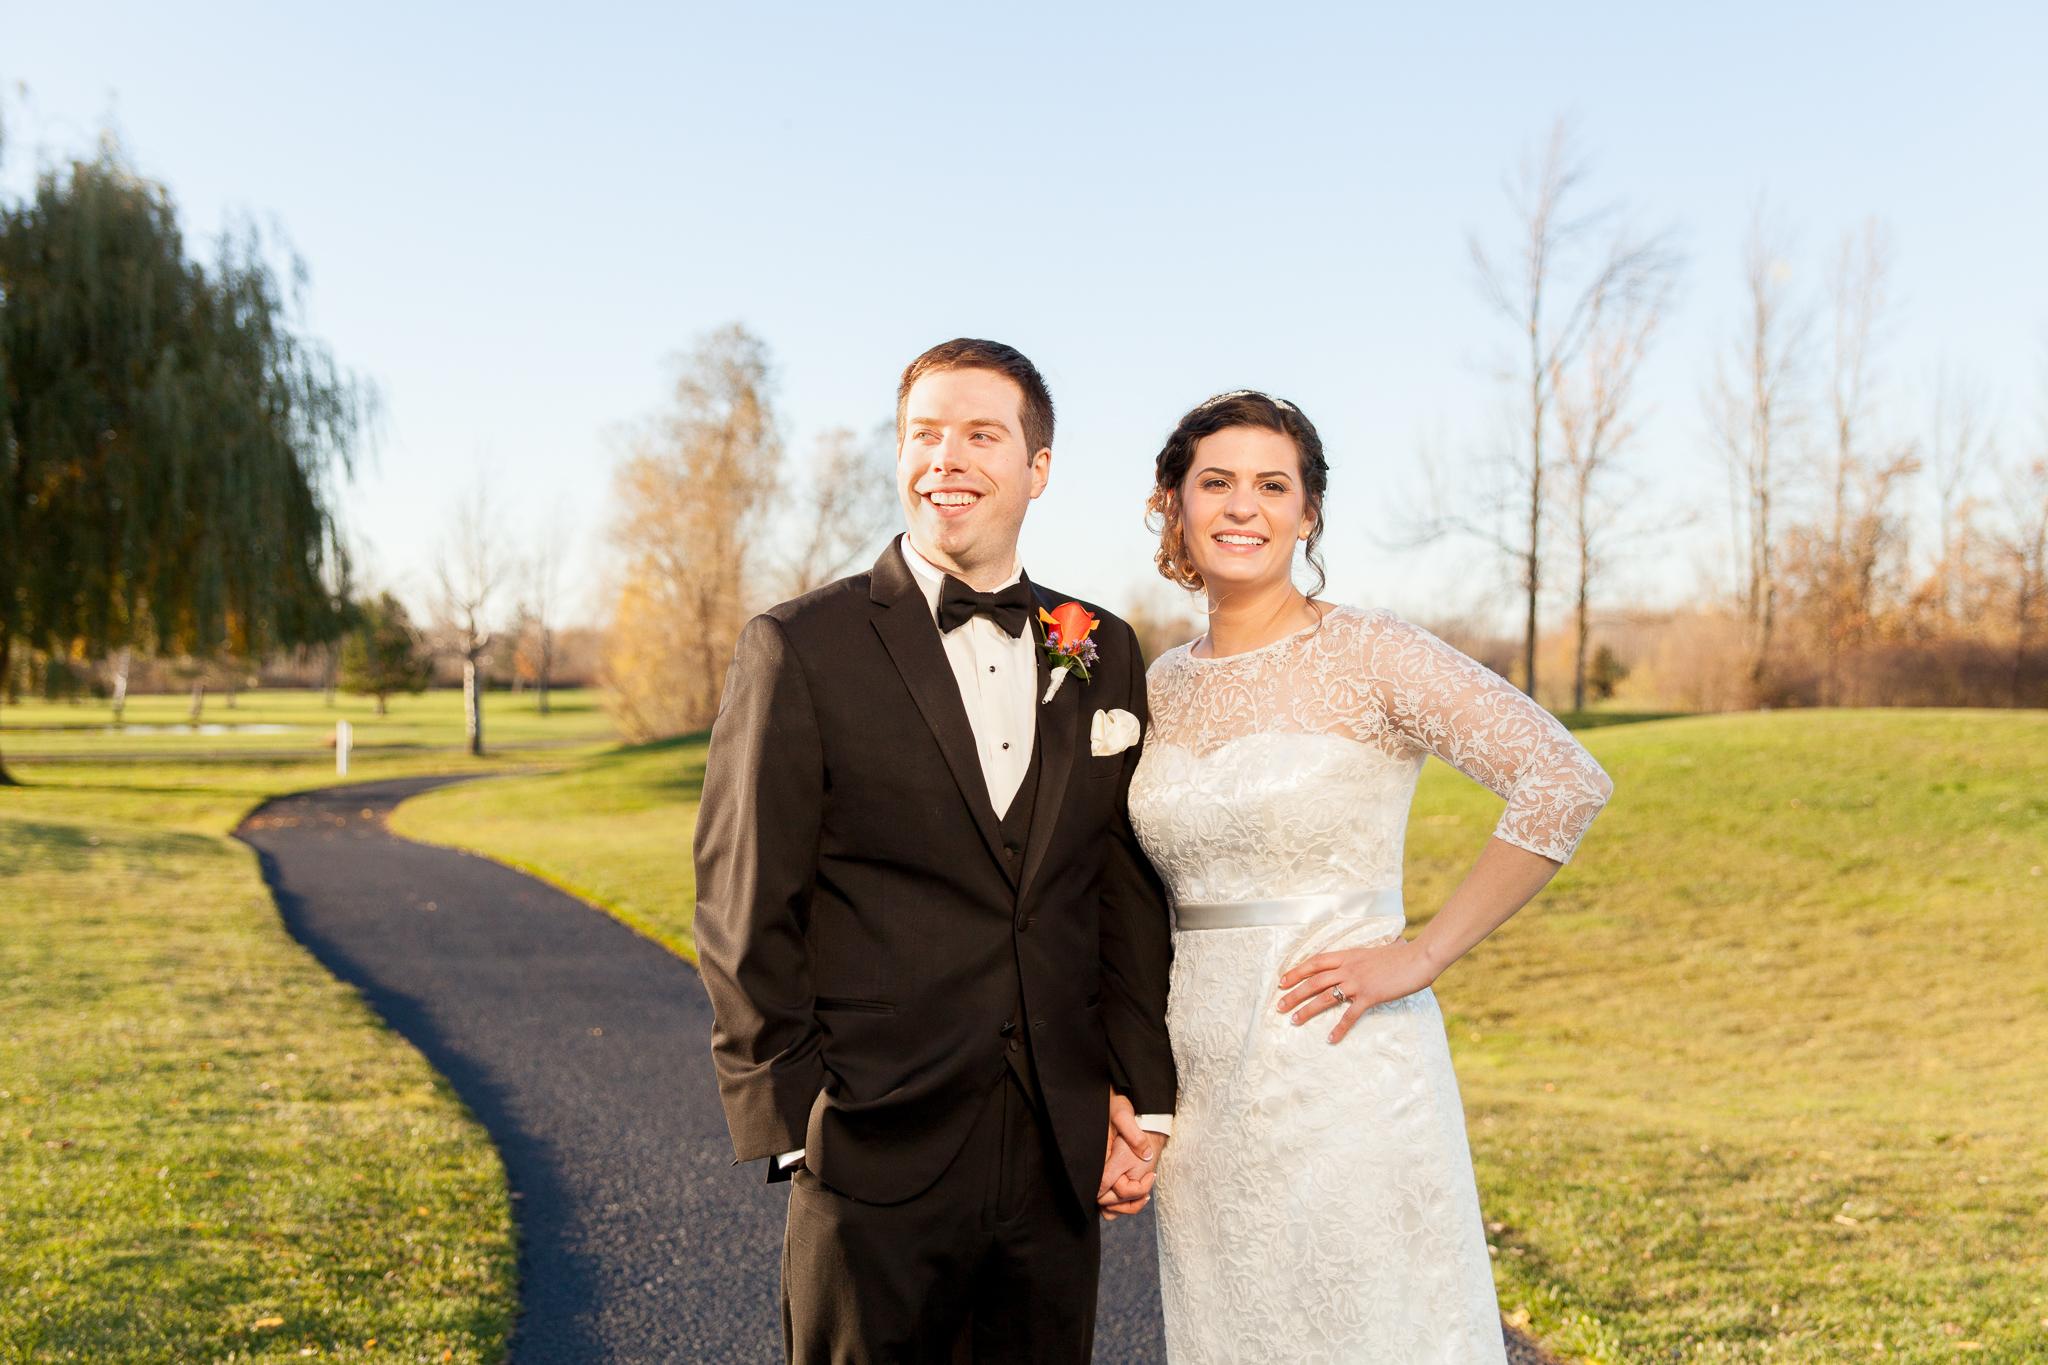 camuglia-whomstudio-chelsea_and_andy-nycphotographer-wedding-brooklyn-buffalo-timberlodge-049-.jpg